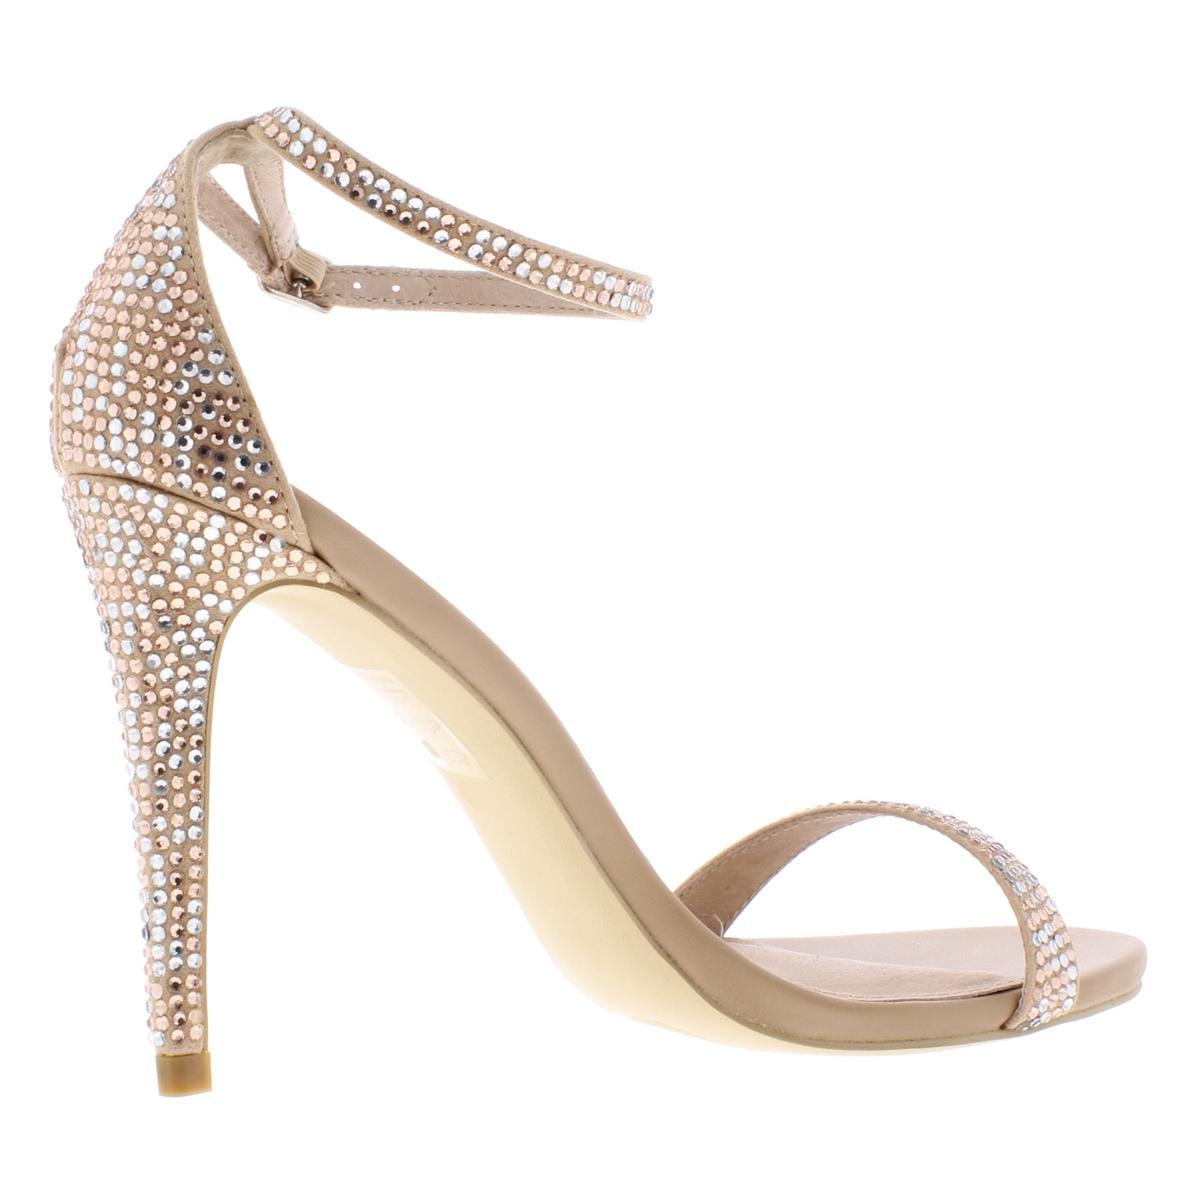 Steve-Madden-Womens-Stecy-Dress-Evening-Sandals-Shoes-BHFO-6444 thumbnail 8